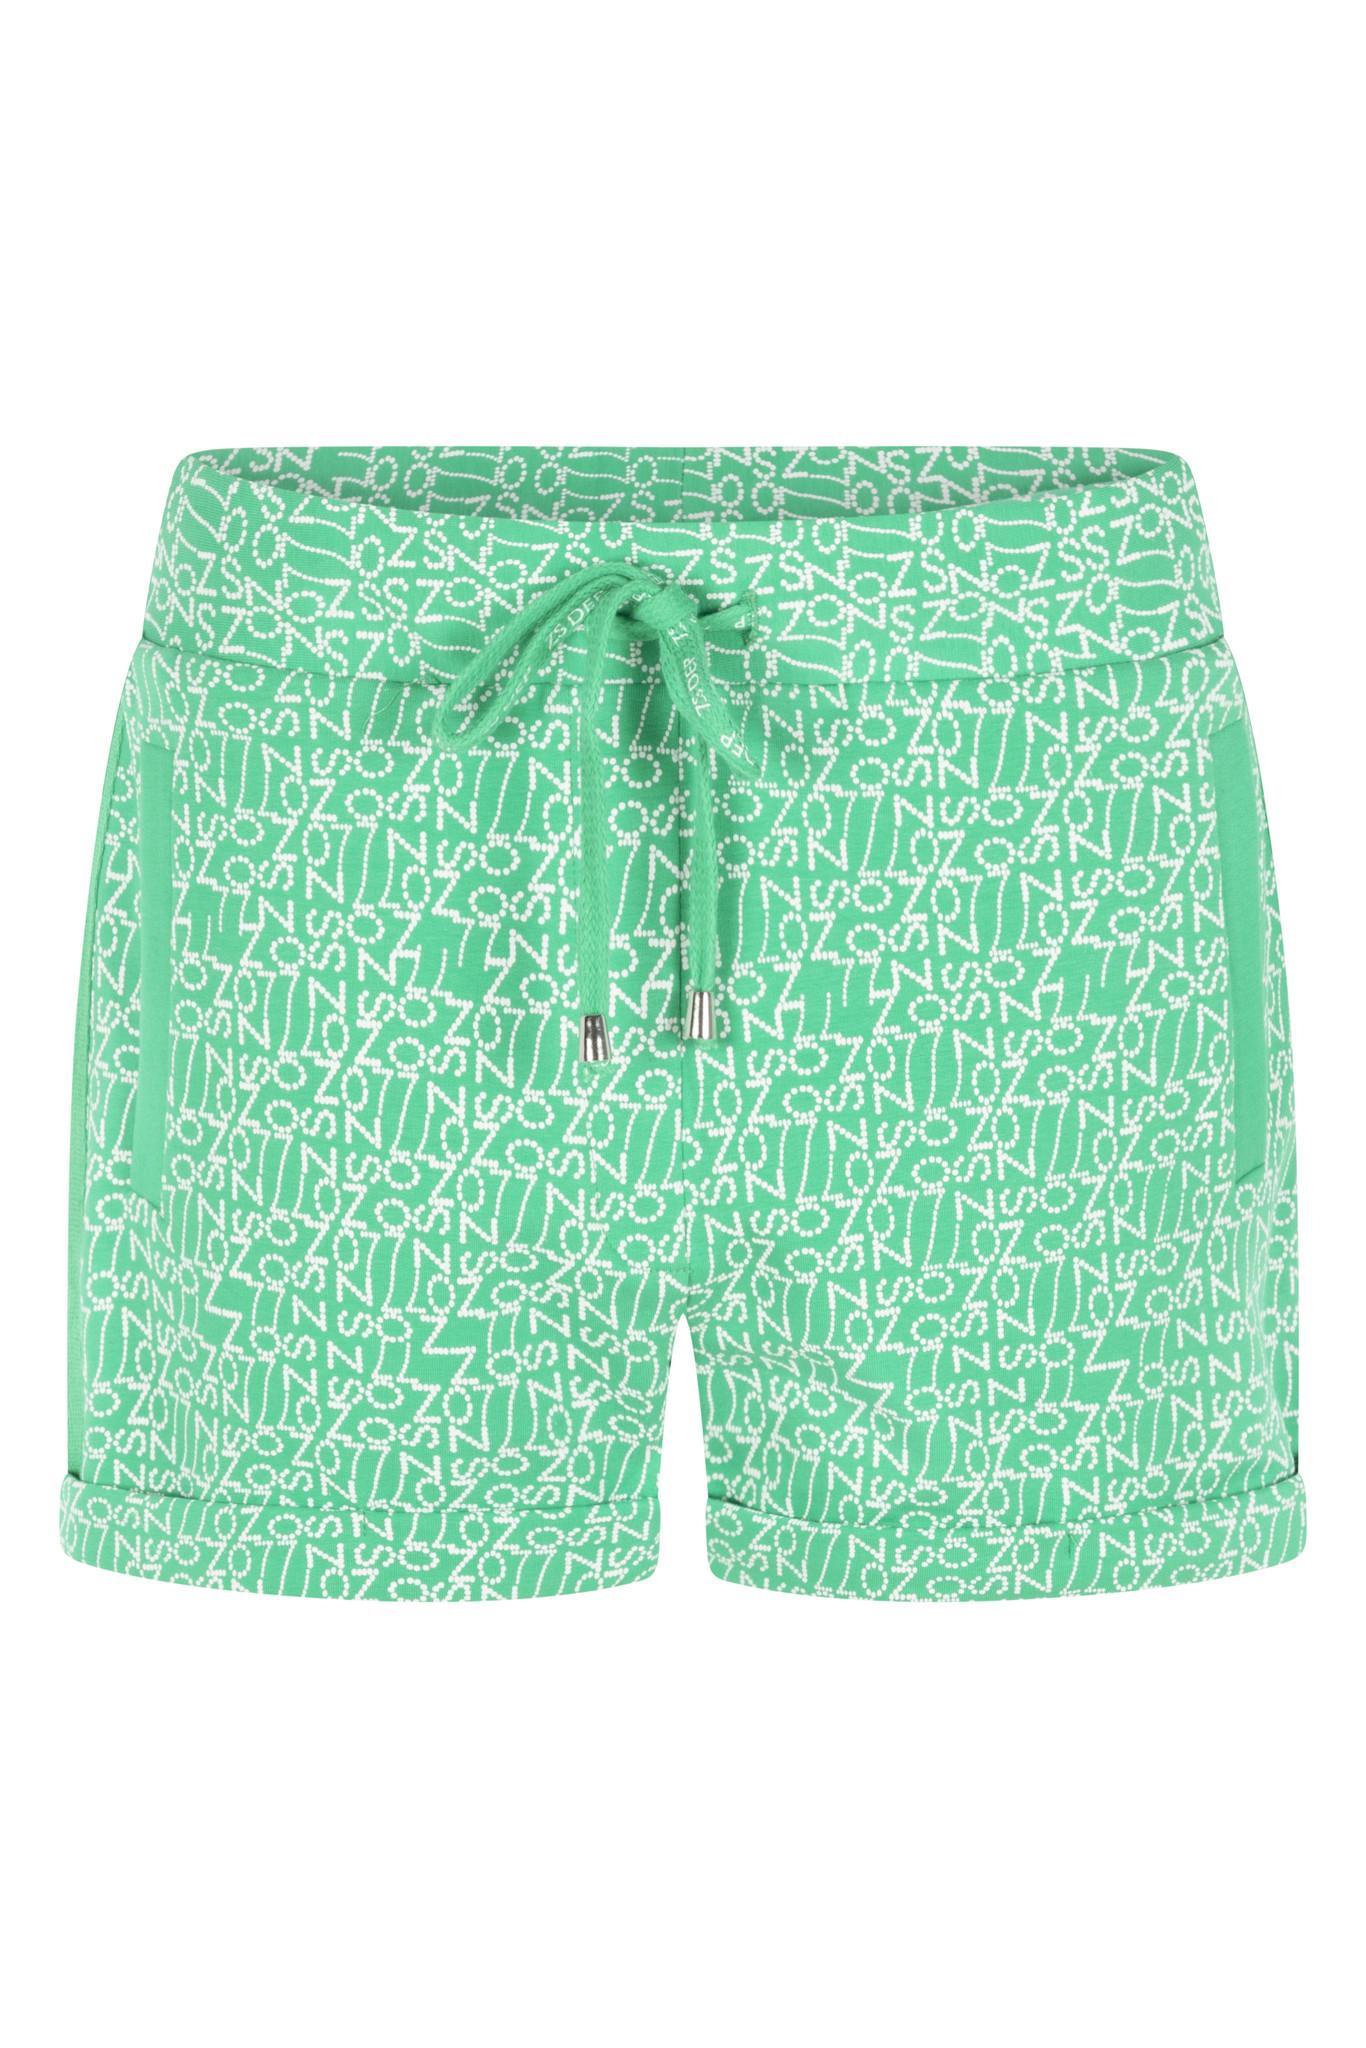 Zoso Zoso Sky short printed sweat groen/wit